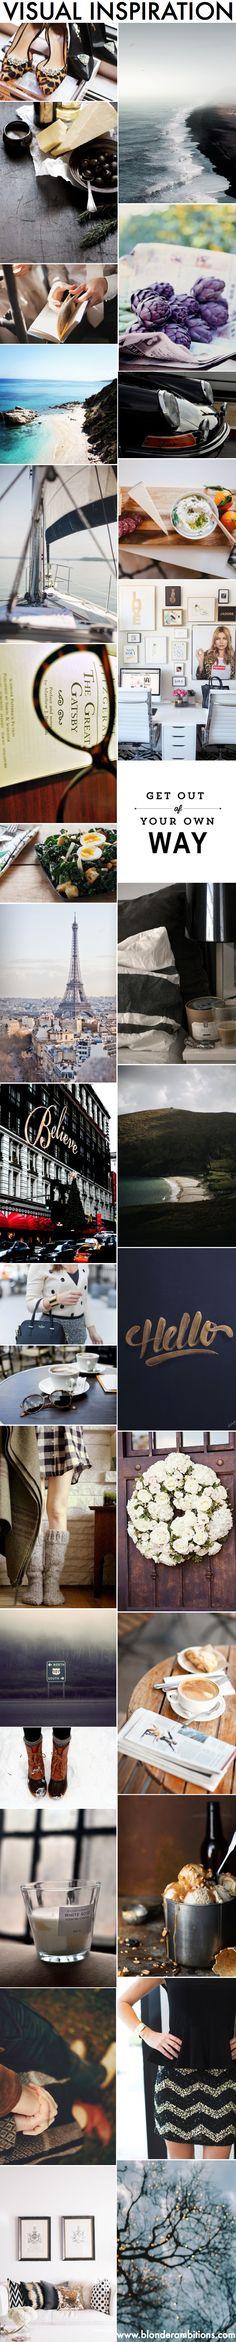 VISUAL INSPIRATION | BLONDER AMBITIONS. fashion. travel. lifestyle. fashion blog. food. luxury. literature. quotes.